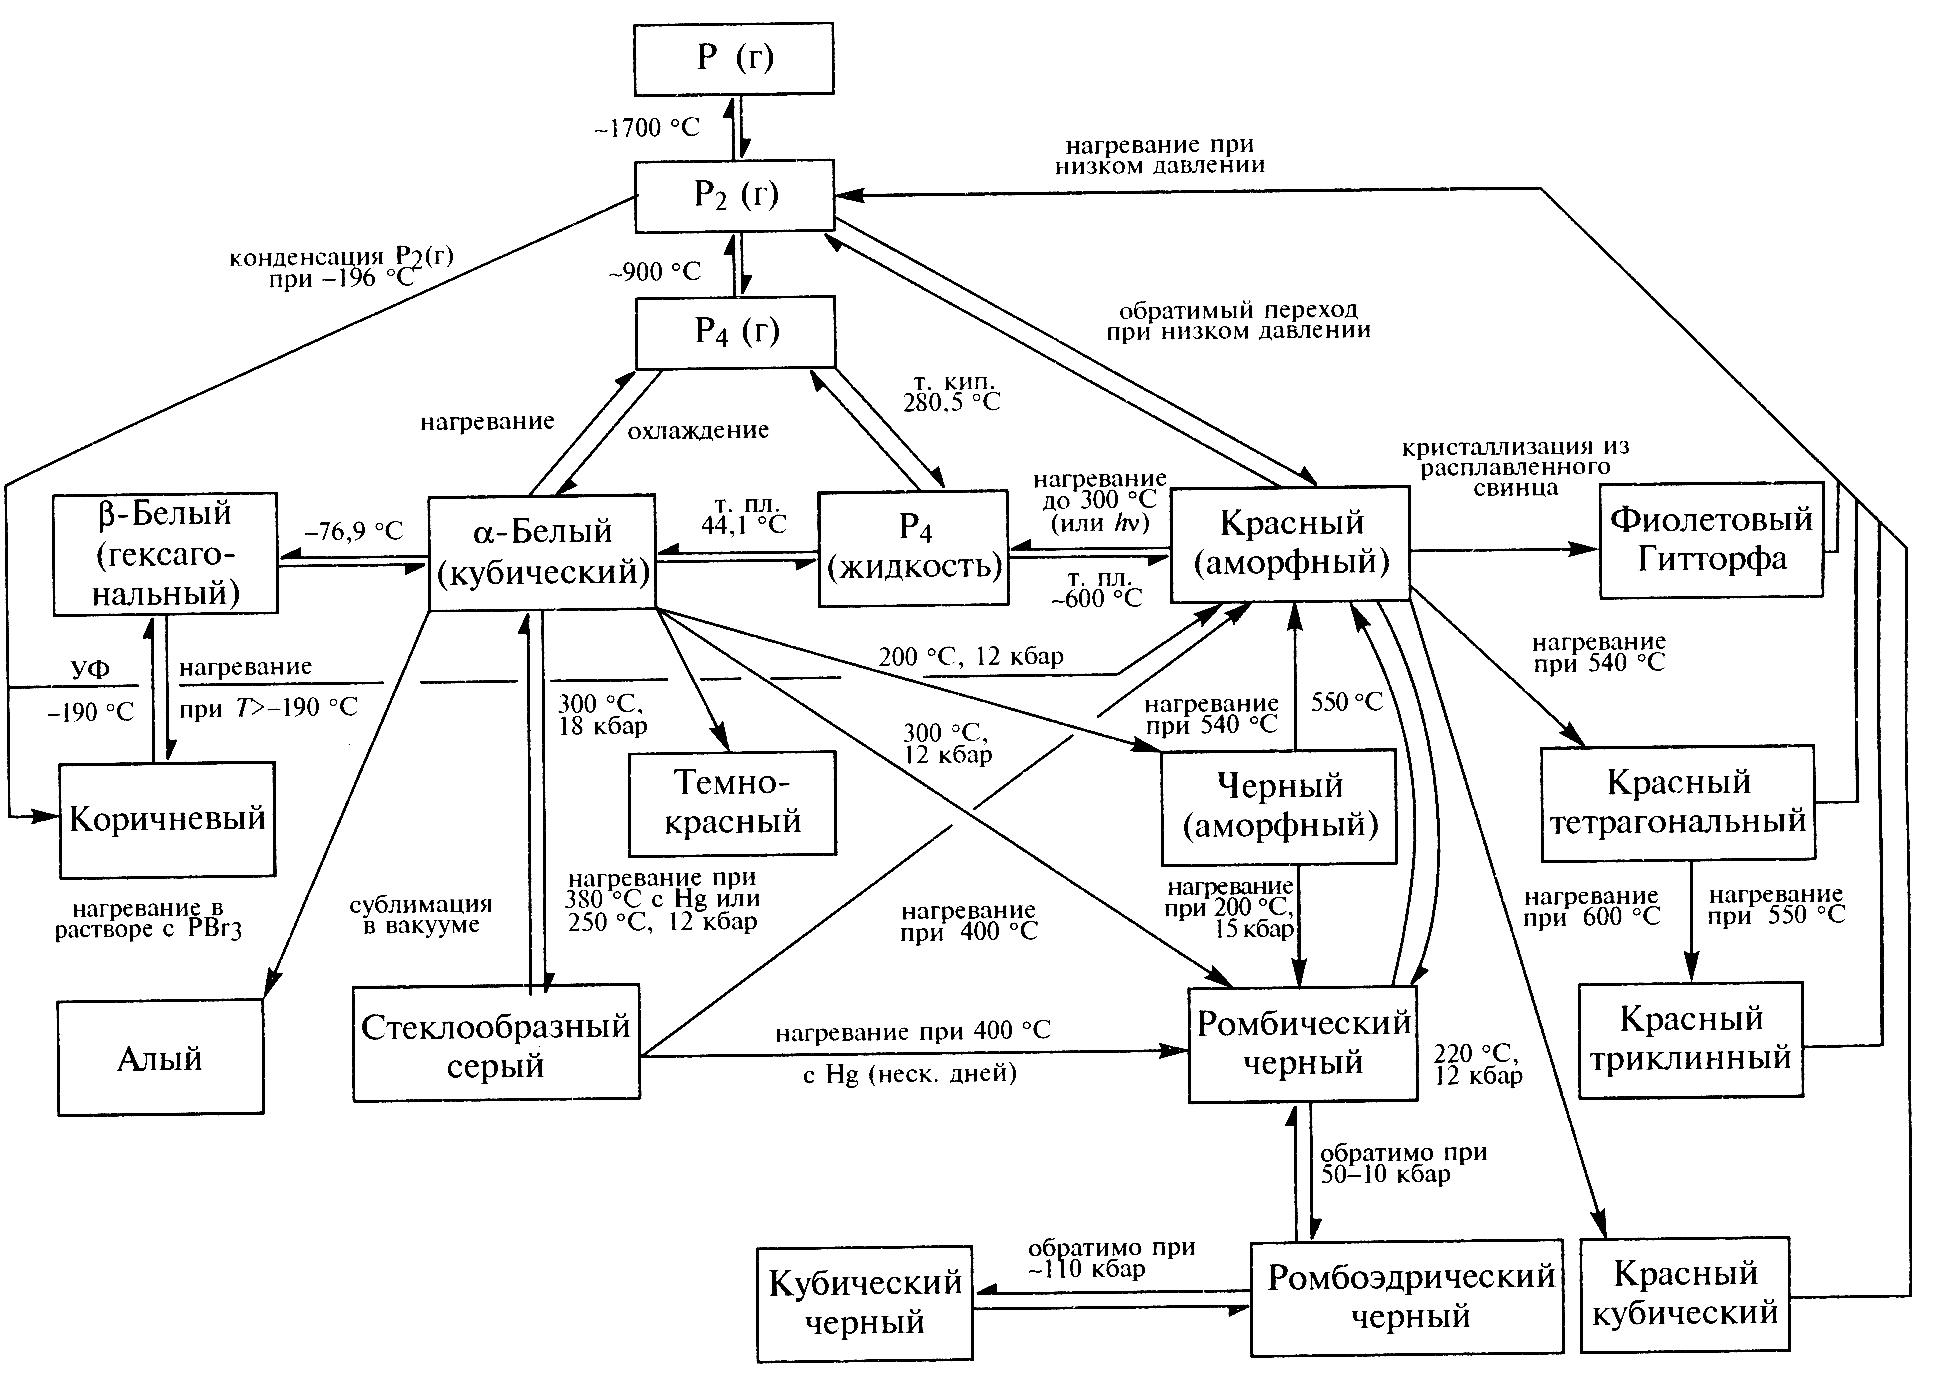 Взаимосвязь между аллотропными модификациями фосфора